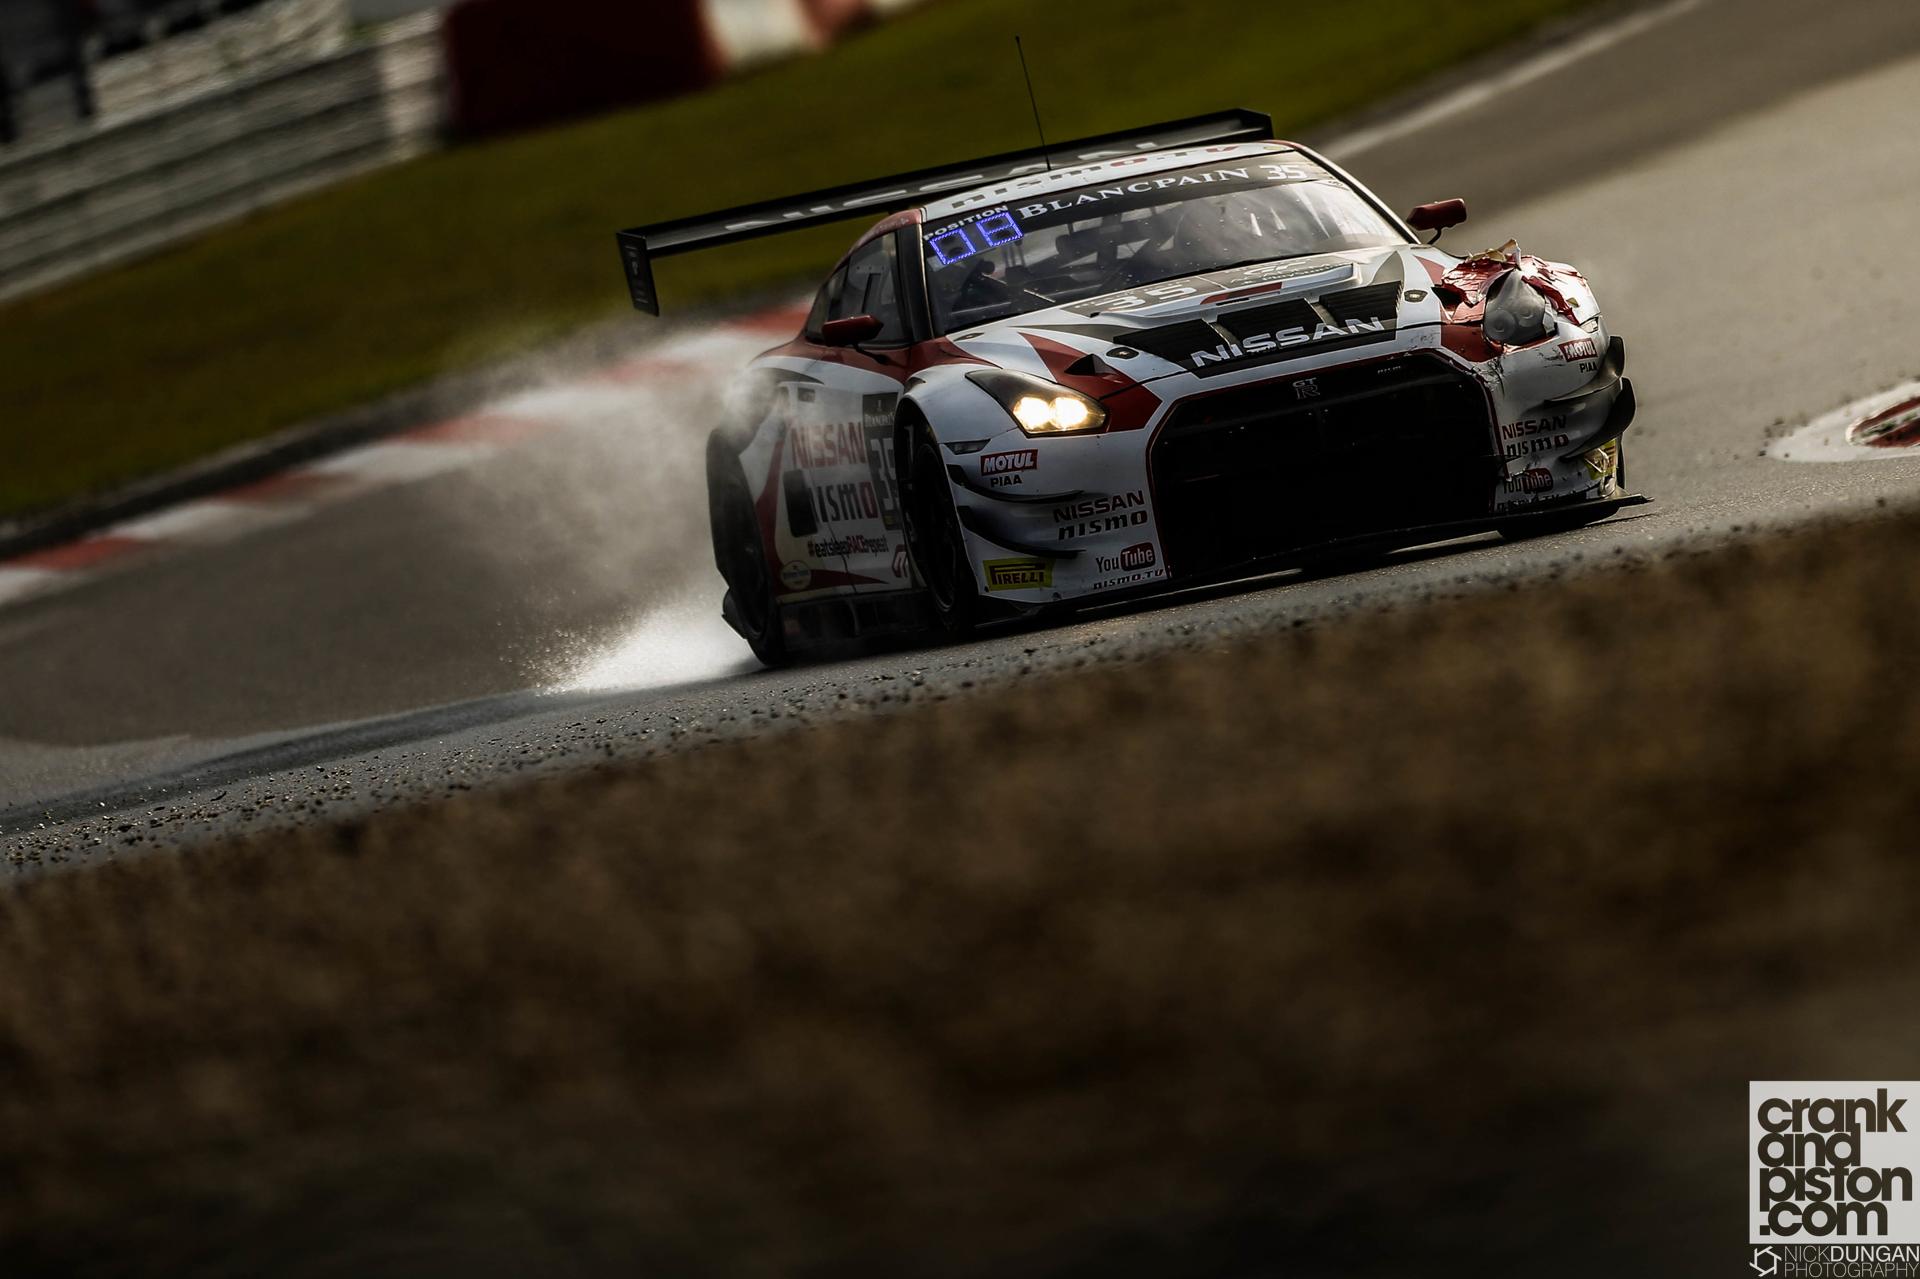 Florian Strauss, Nick McMillen, Alex Buncombe Nissan GT Academy Team RJN Nissan GT-R Nismo GT3 - Blancpain i-Racing N¸rburgring 1000 at N¸rburgring -  - Germany